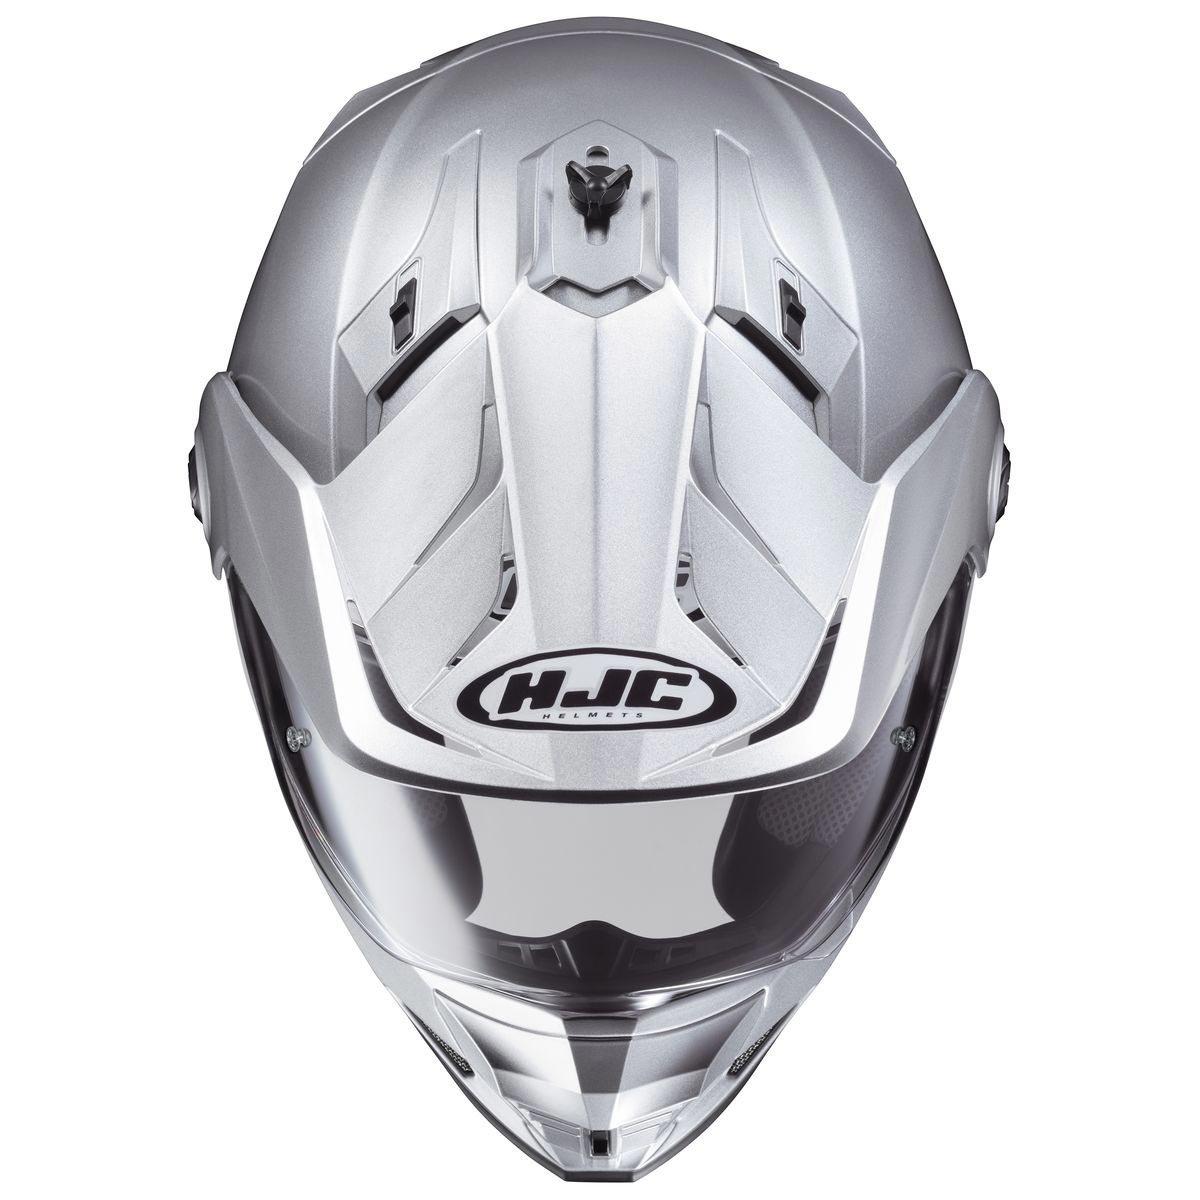 Silver, Large HJC Helmets Unisex-Adult Full-Face-Helmet-Style DS-X1 Metallic Helmet 510-574